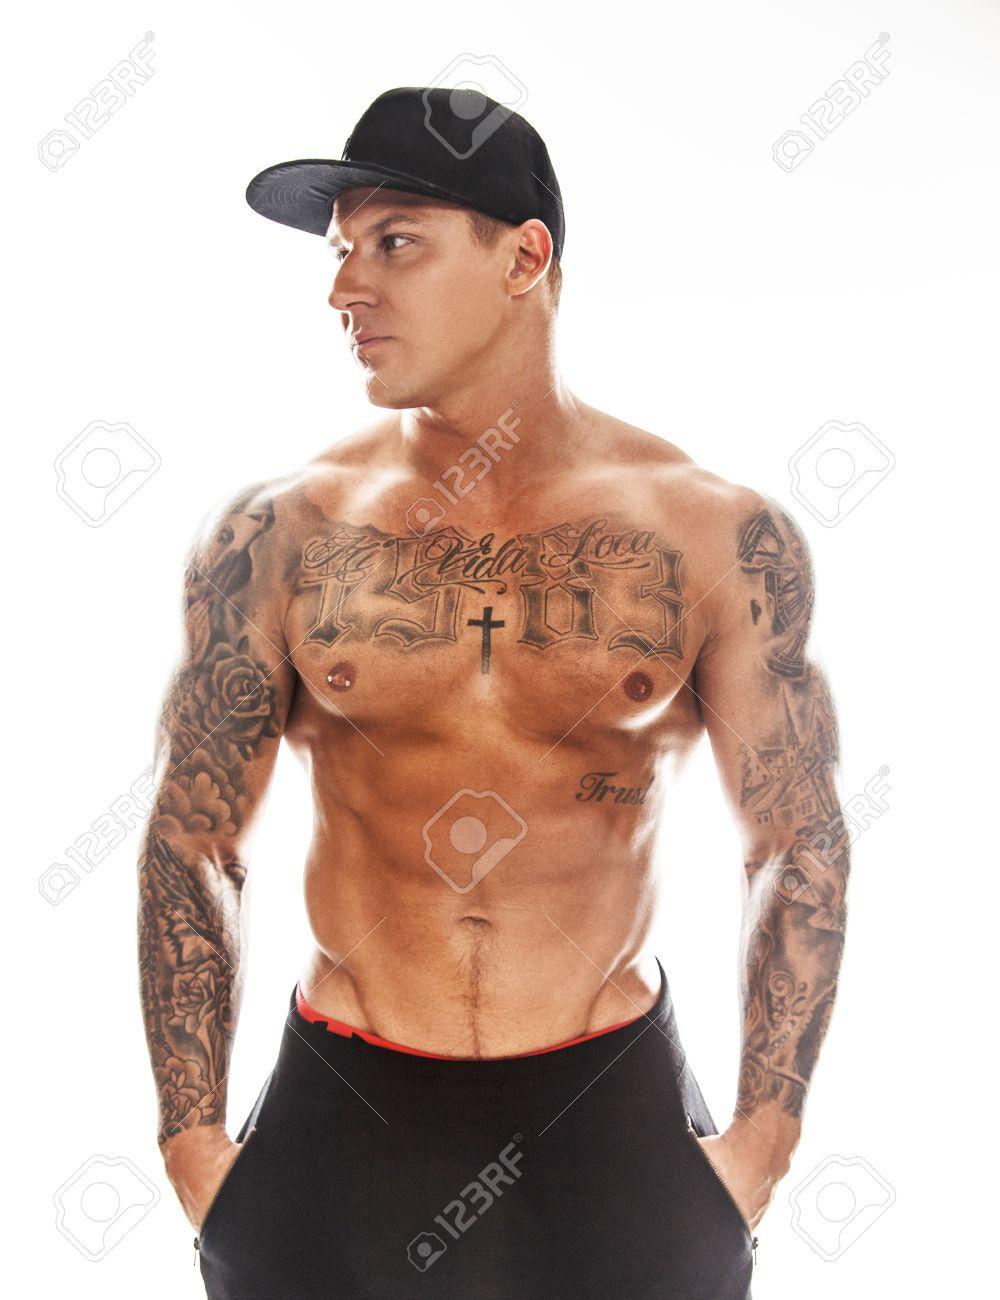 Tattoos muskulöse männer mit Tattoos bei